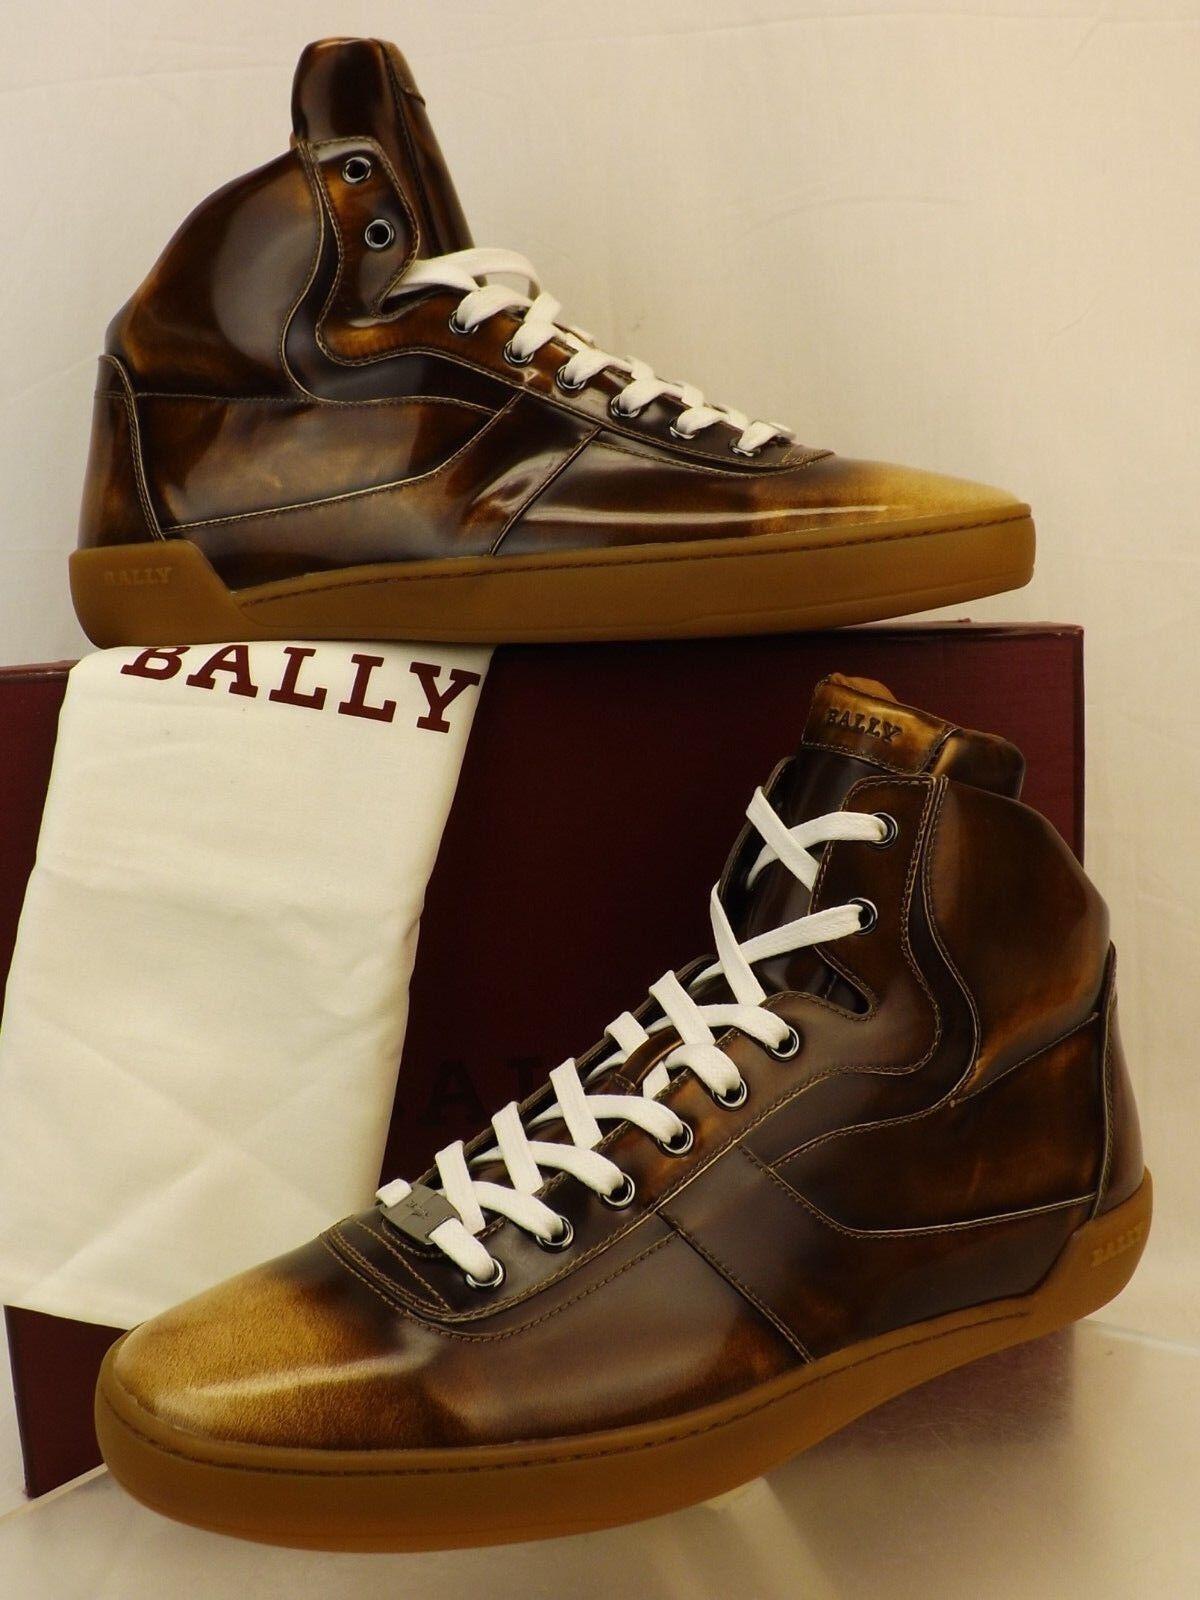 NIB BALLY EROY CUIR BRUSHED LEATHER LOGO HI TOP LACE UP scarpe da ginnastica 8.5 D US 41.5